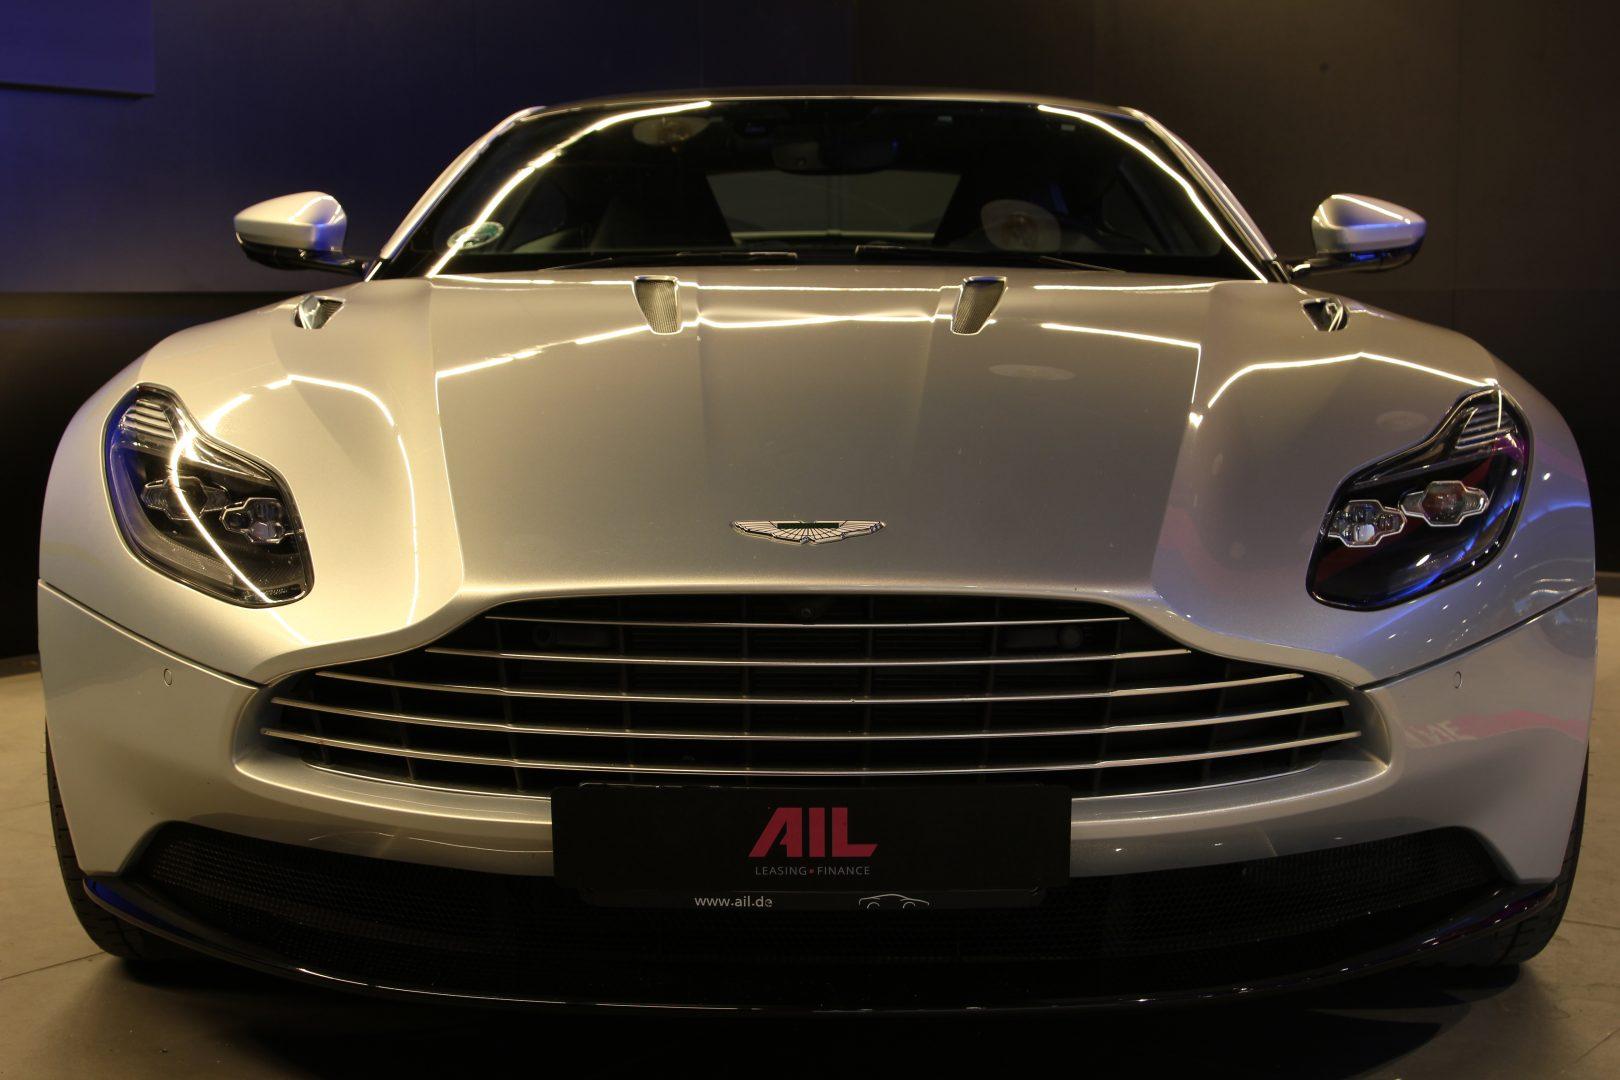 AIL Aston Martin DB11 Coupe 5.2 V12 3